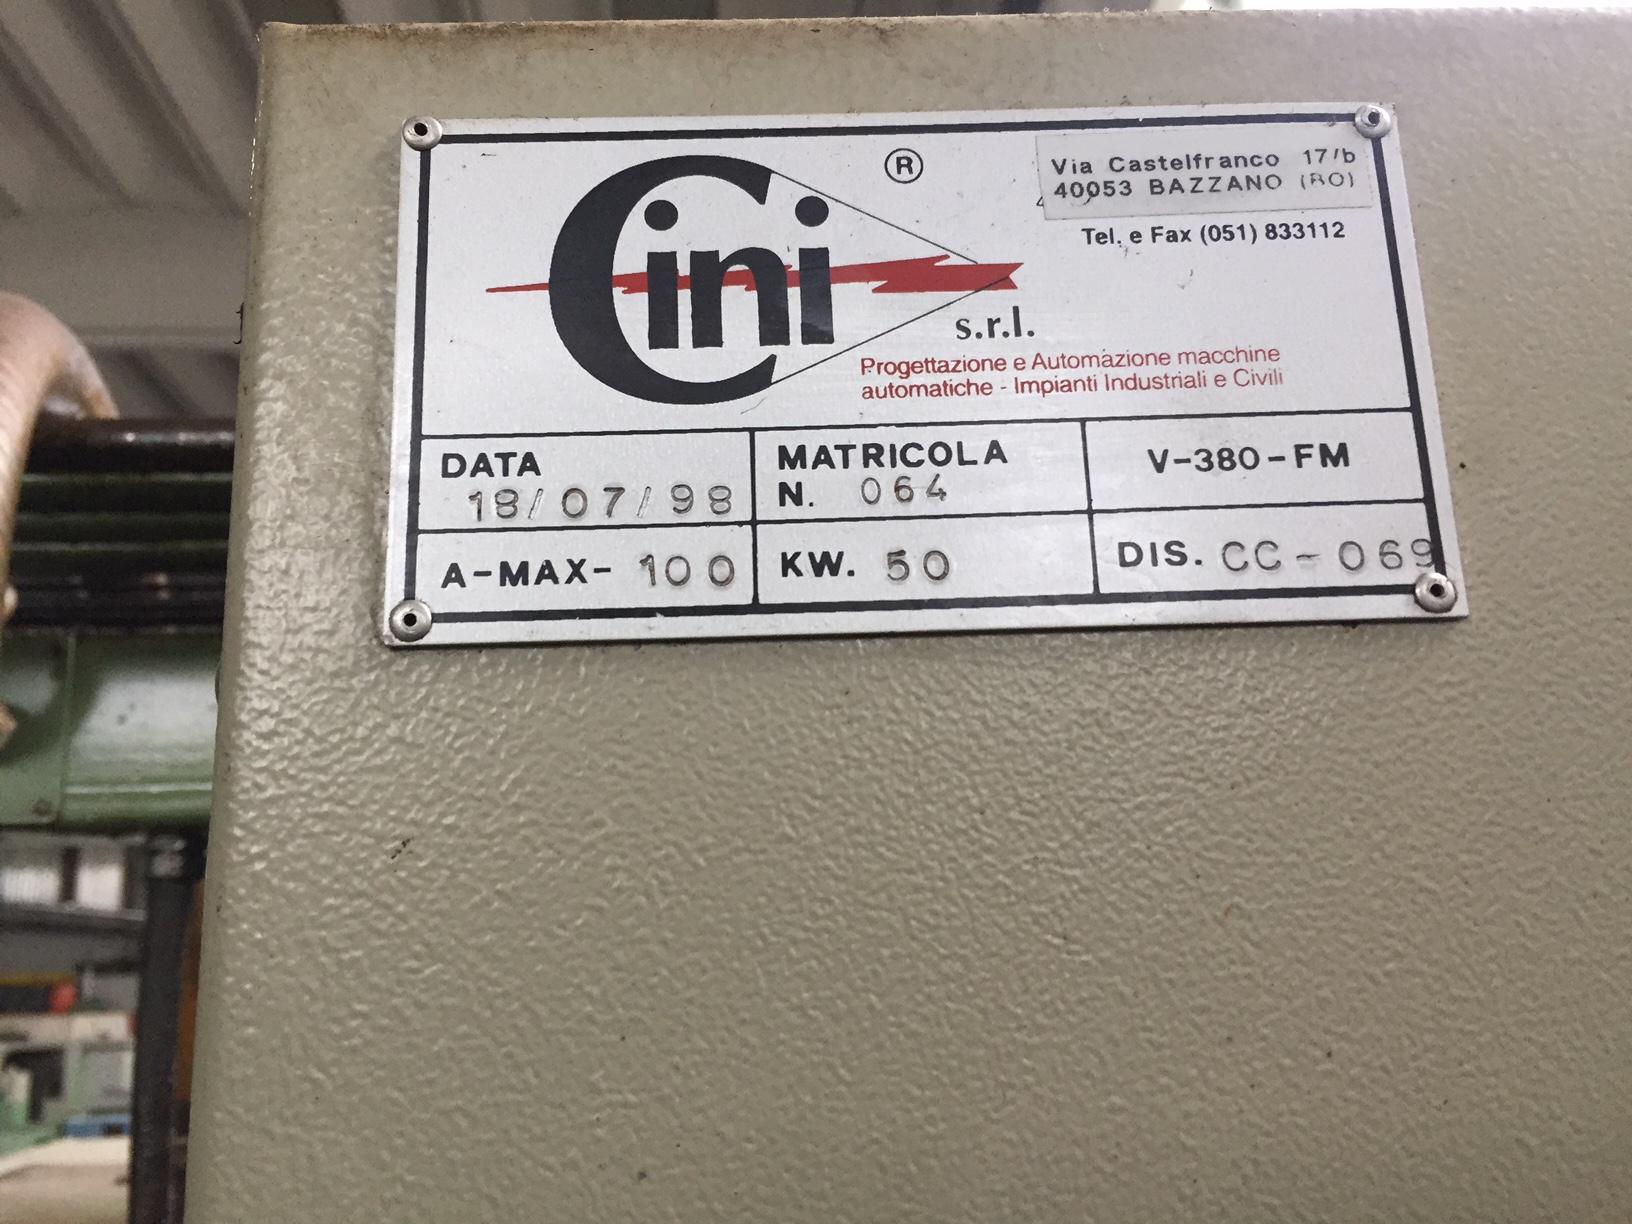 Lot 33 - Trevisan Transfer Machine